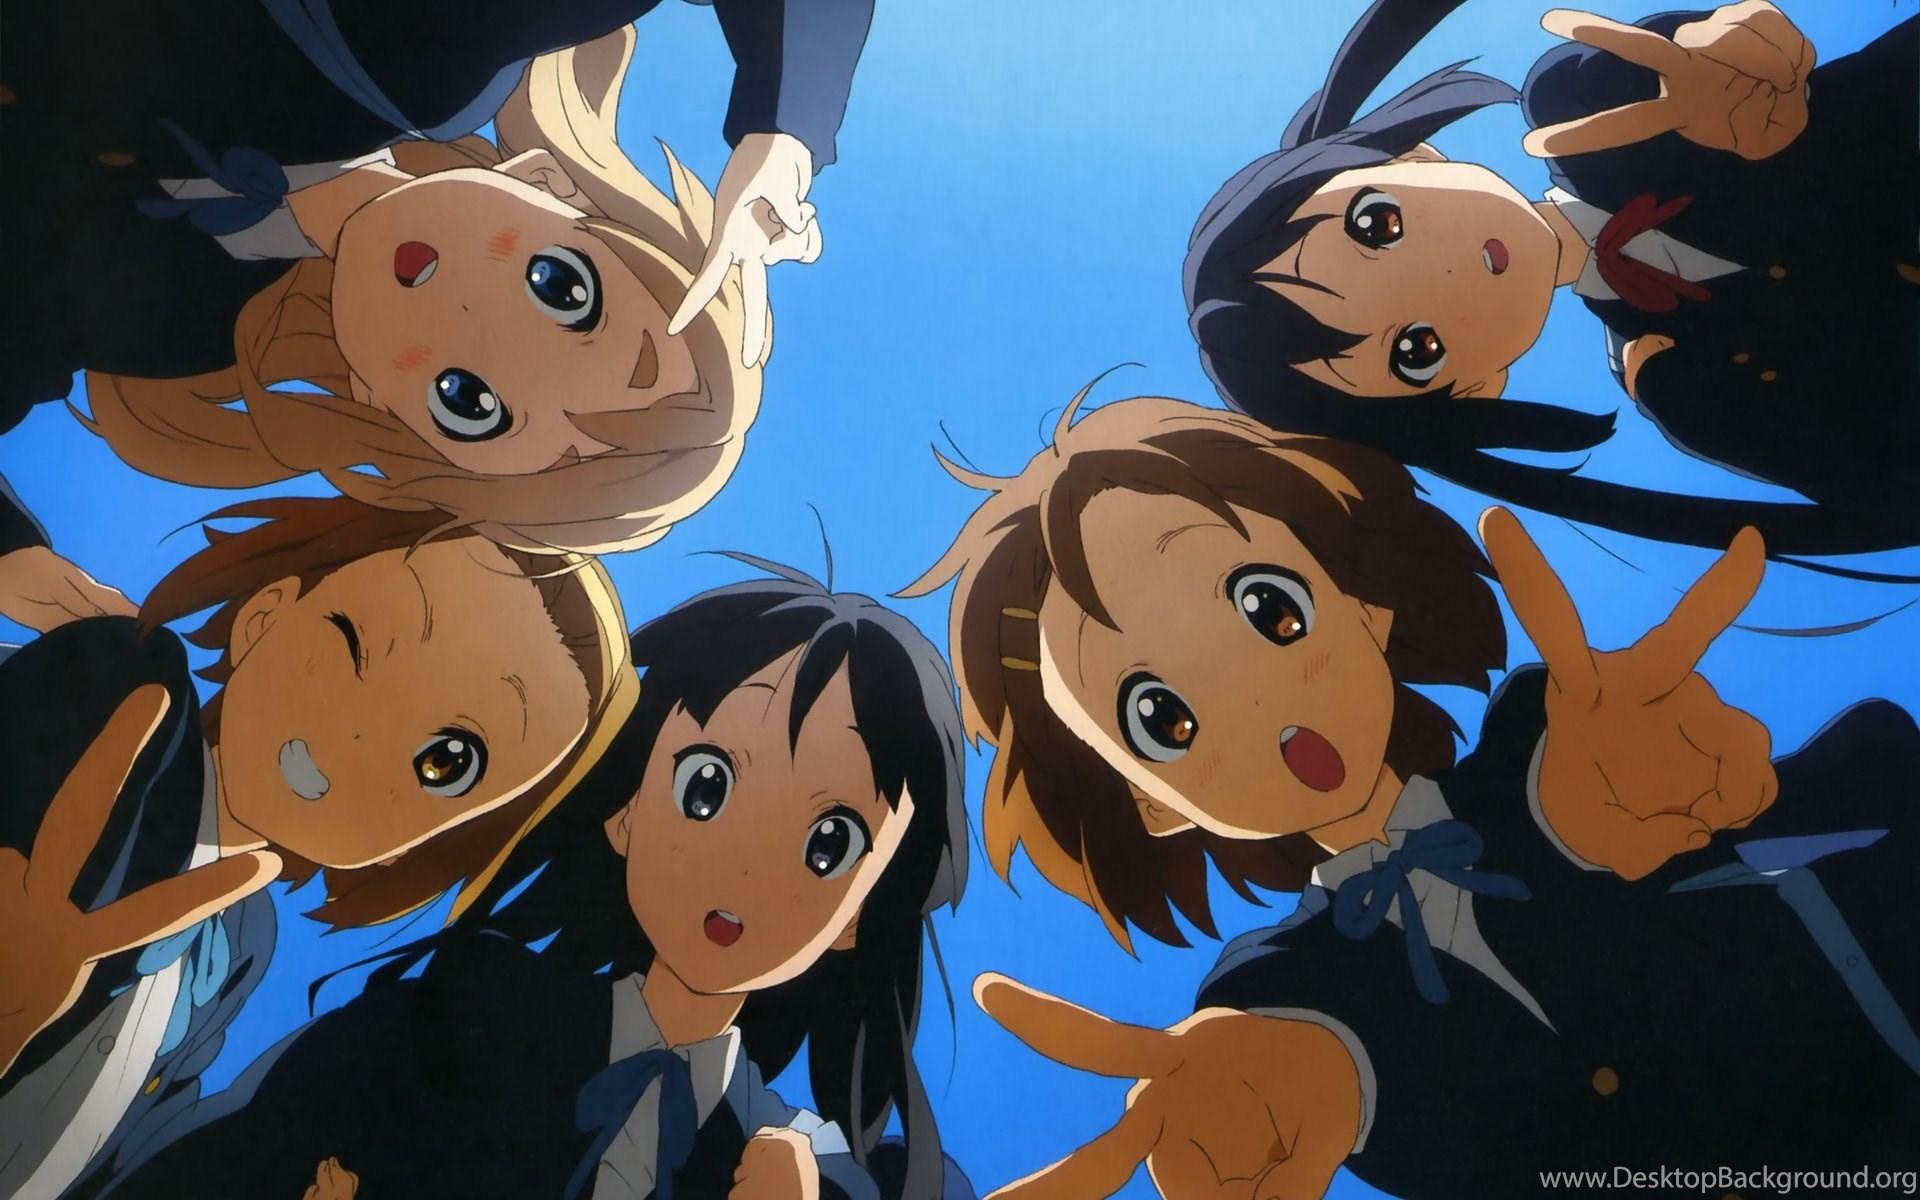 K On Desktop Wallpapers In HD Popular Anime TV Series Background